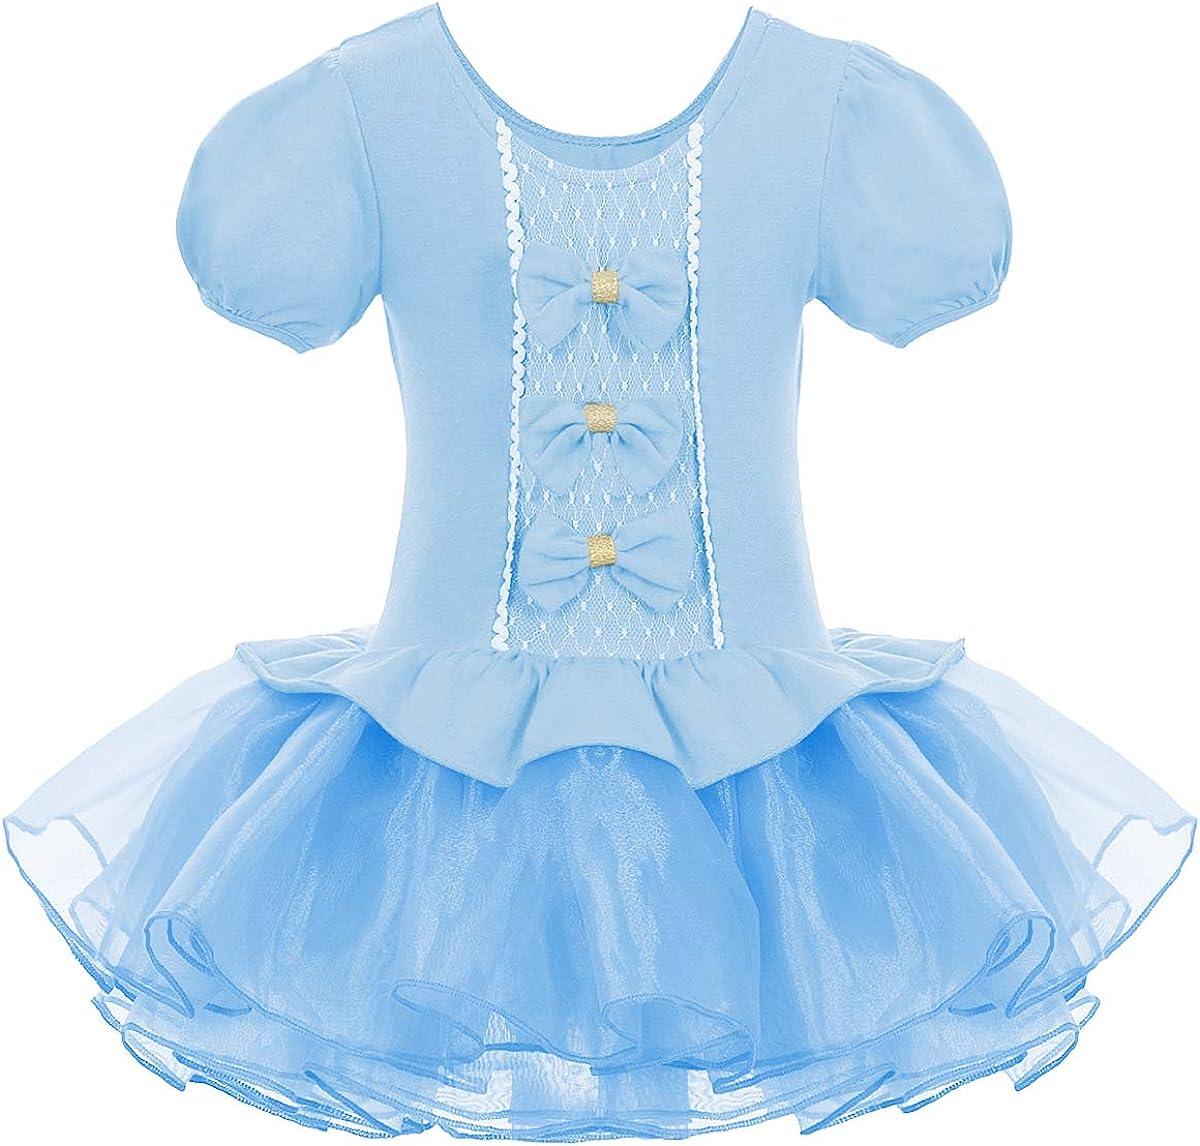 Details about  /Girls Ballet Tutu Dress Contemporary Puff Sleeves Velvet Dance Costume For Kids